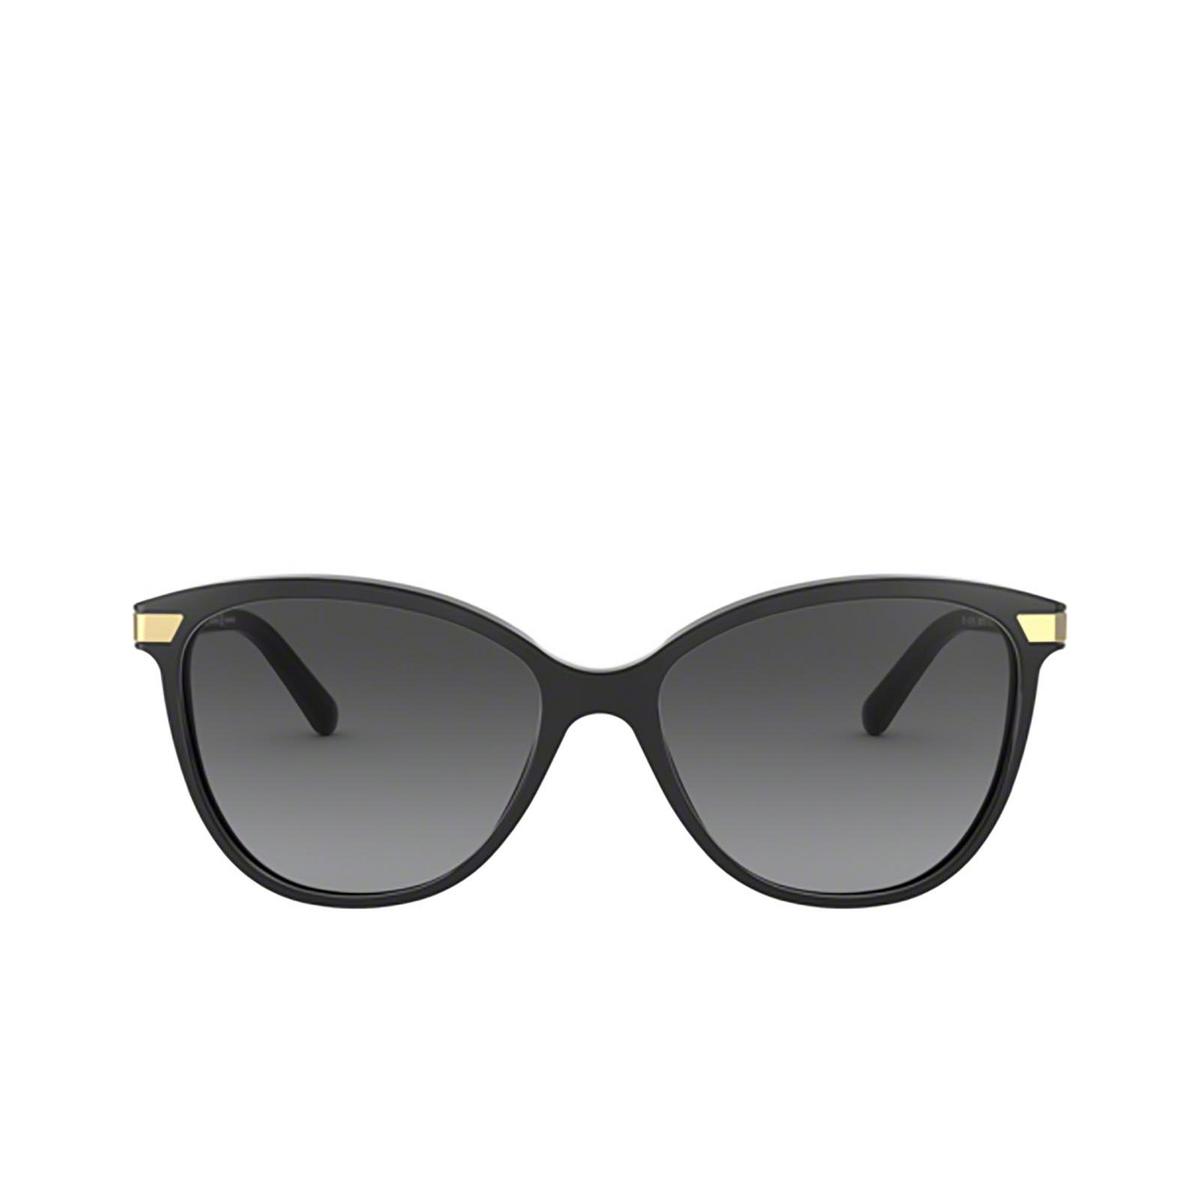 Burberry® Cat-eye Sunglasses: BE4216 color Black 3001T3.